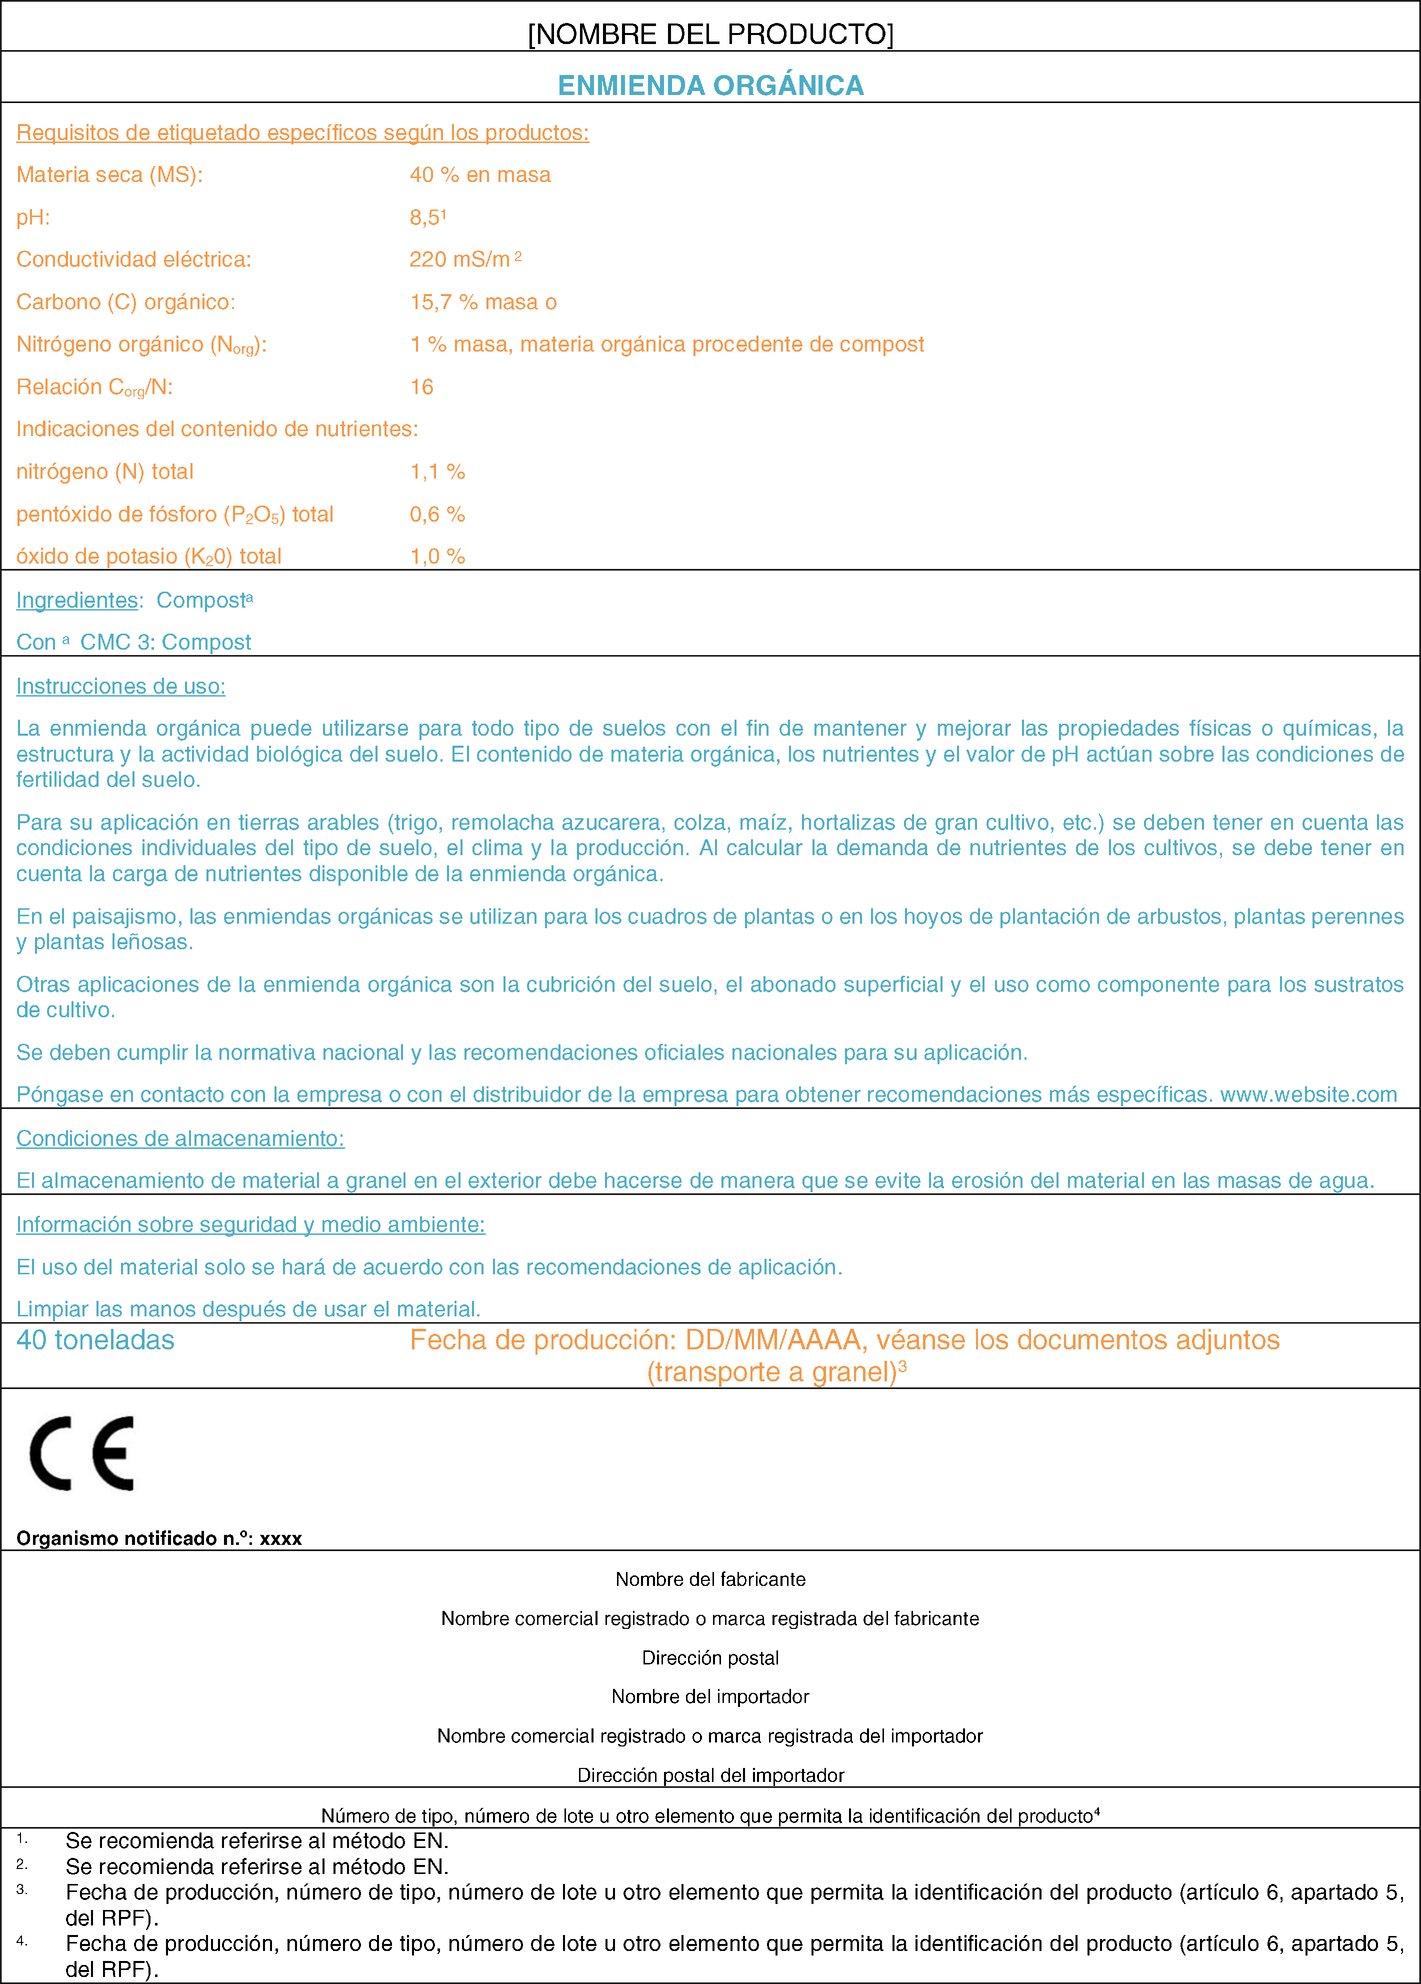 Imagen: http://publications.europa.eu/resource/uriserv/OJ.C_.2021.119.01.0001.01.SPA.xhtml.C_2021119ES.01002801.tif.jpg